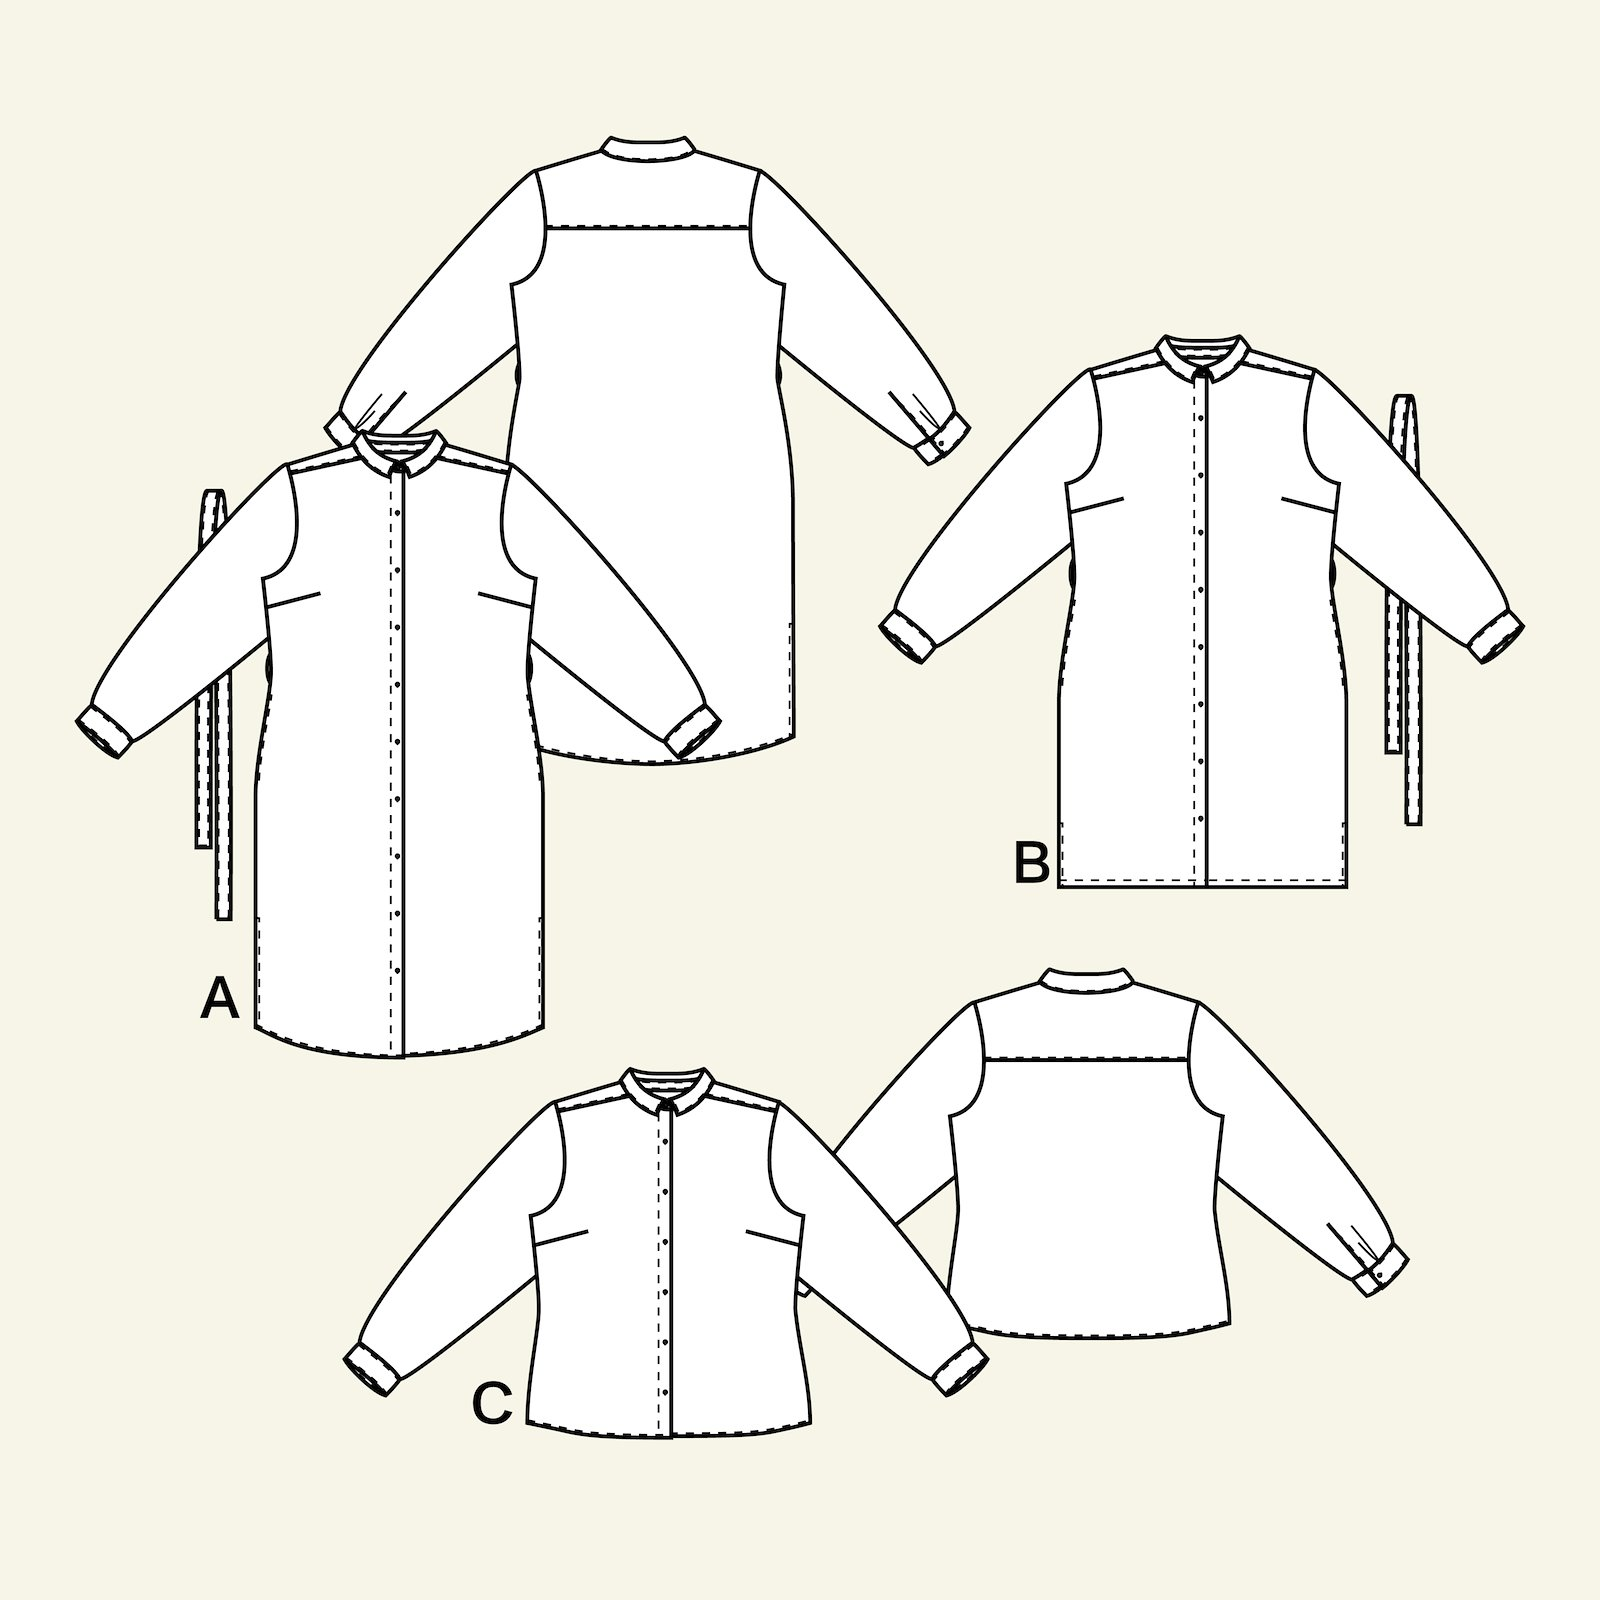 Shirt and shirtdress, 42/14 p23156_pack